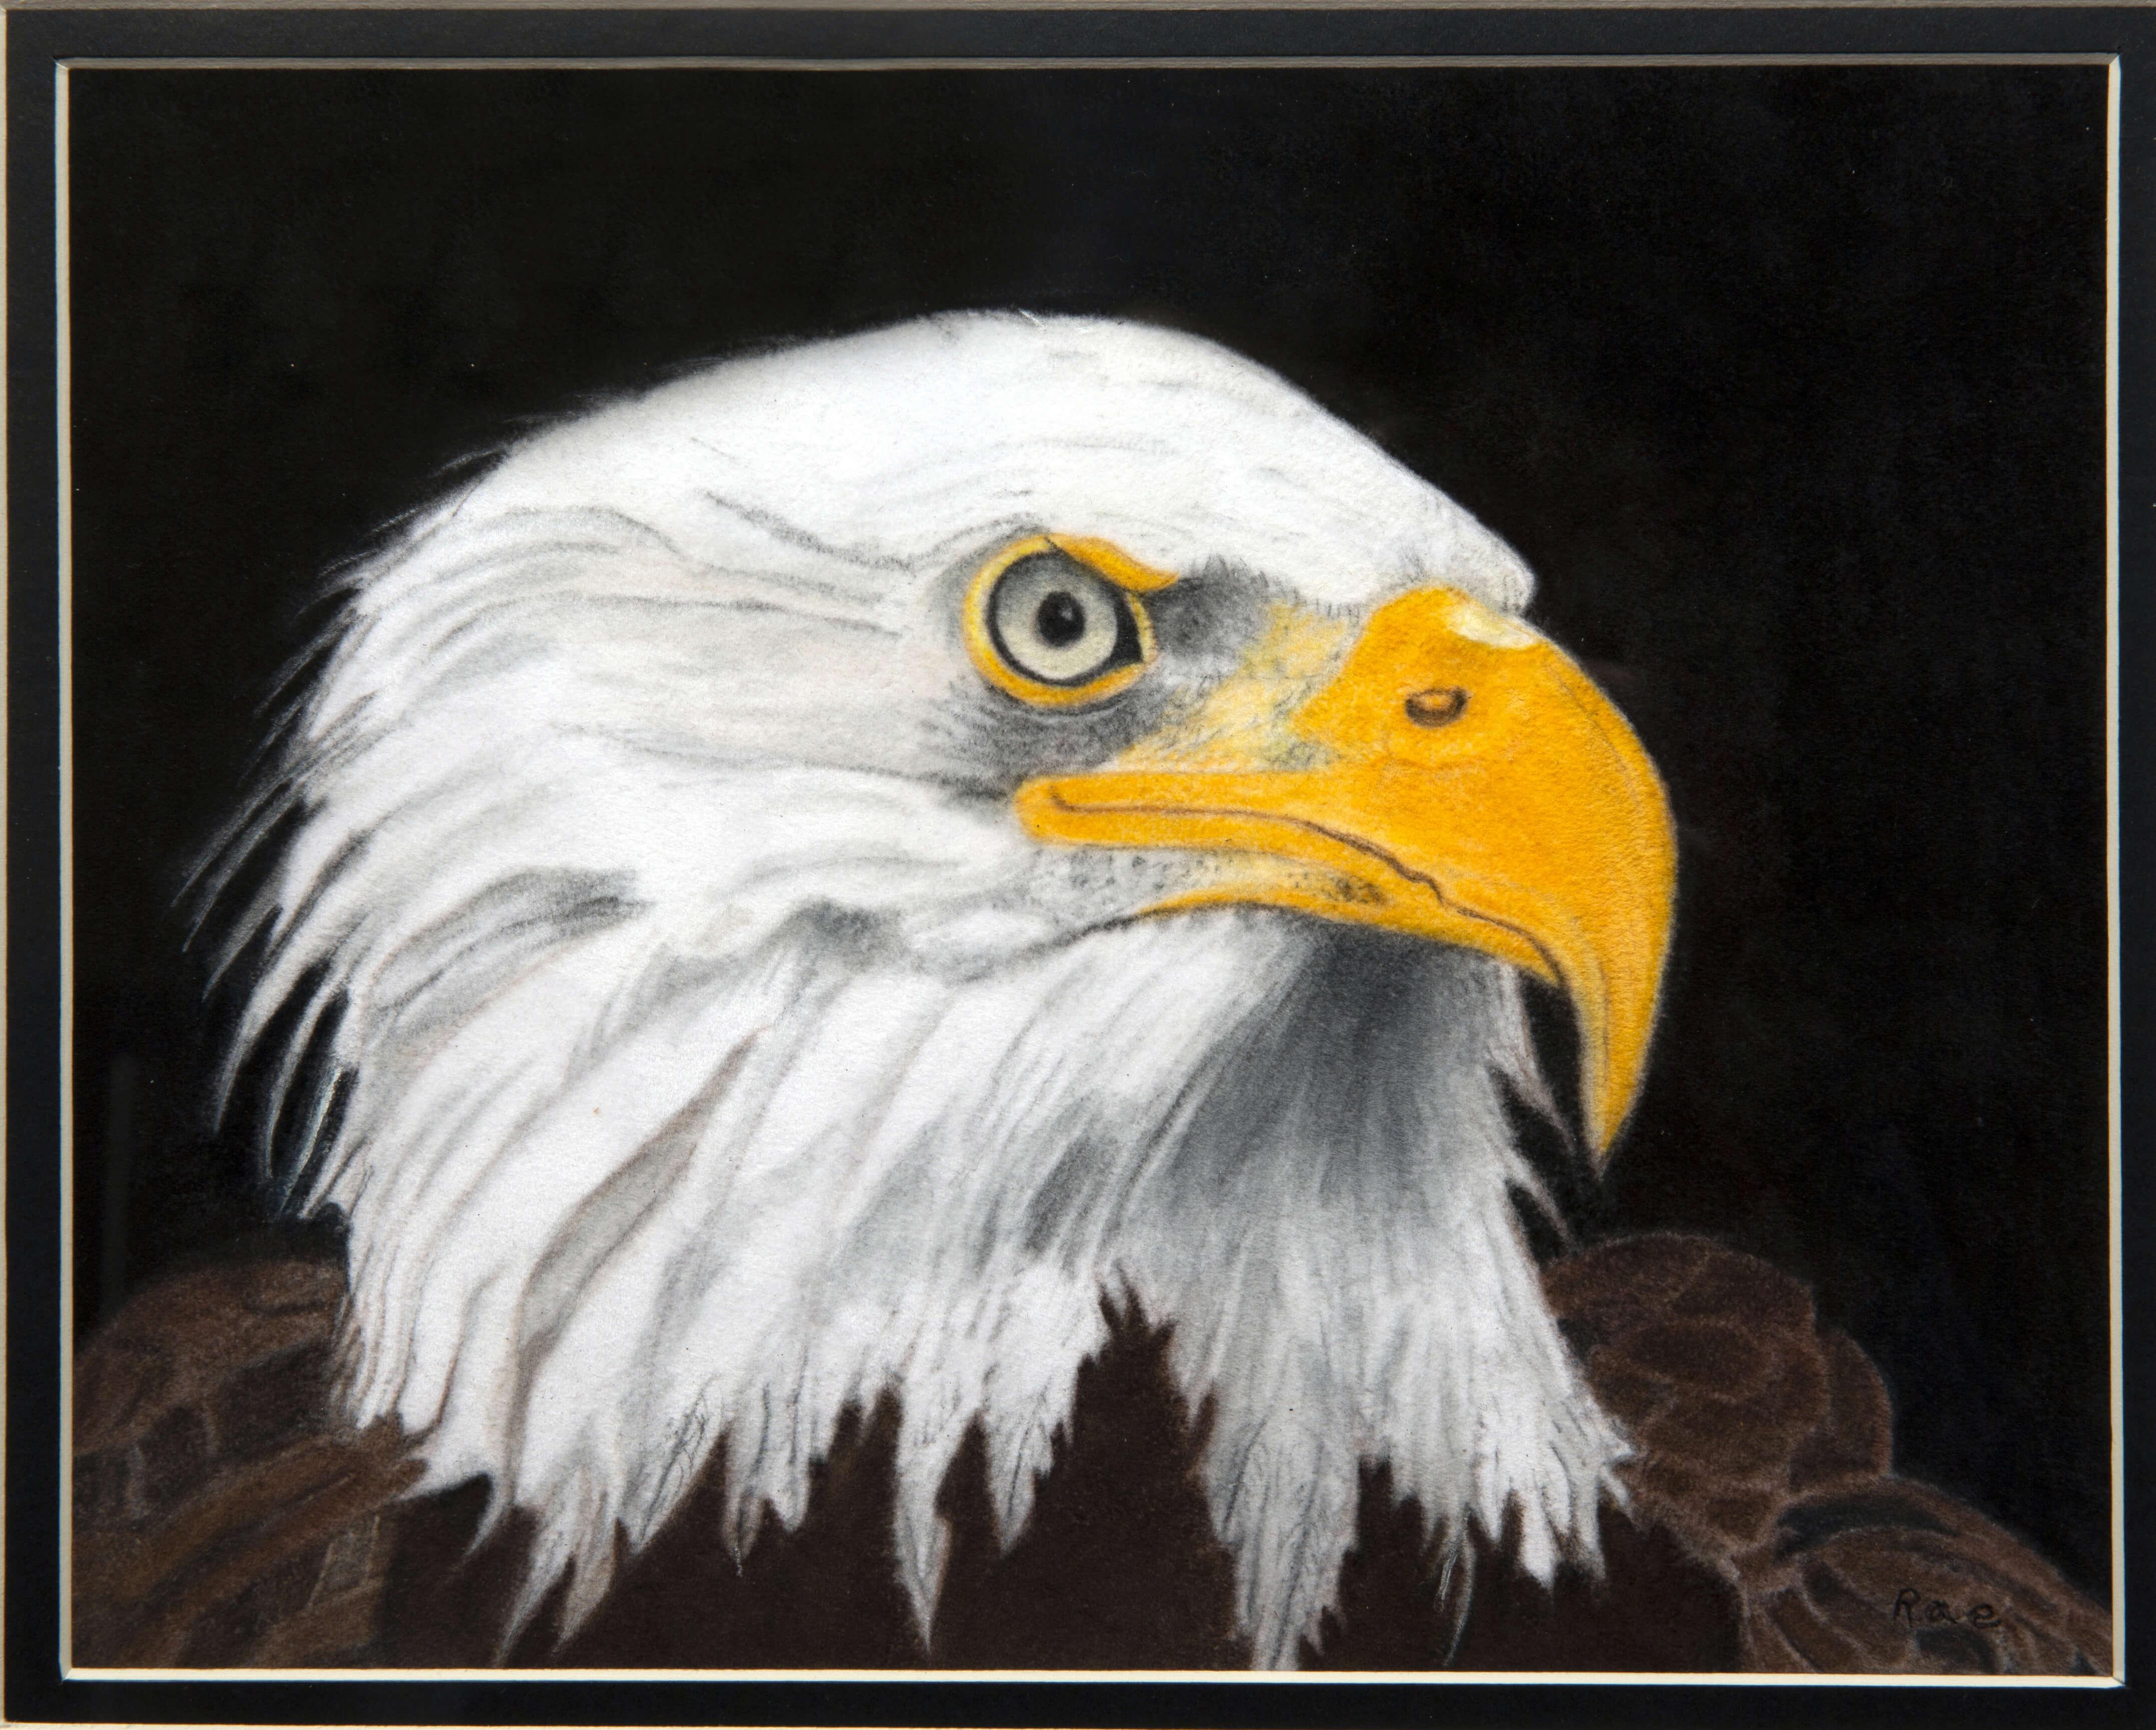 Sharon Nelson's Eagle Eye drawing